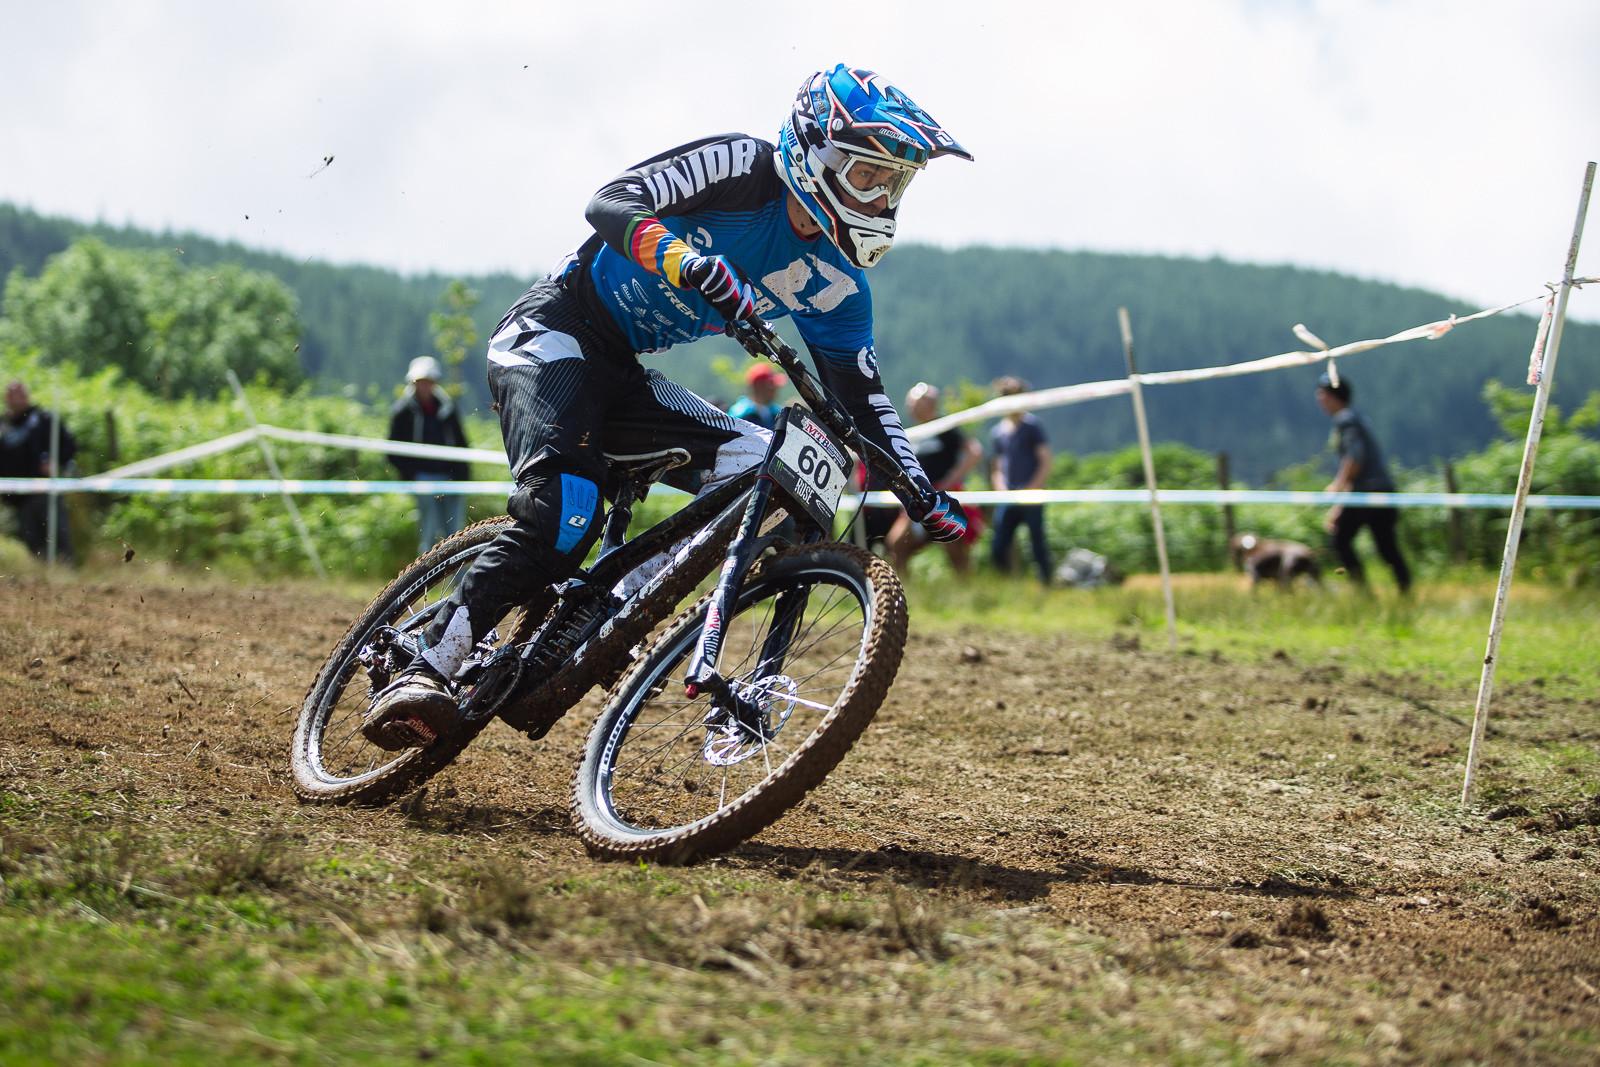 Reece Wilson, British DH Series, Bala - RACE REPORT - 2015 British Downhill Series Bala - Mountain Biking Pictures - Vital MTB